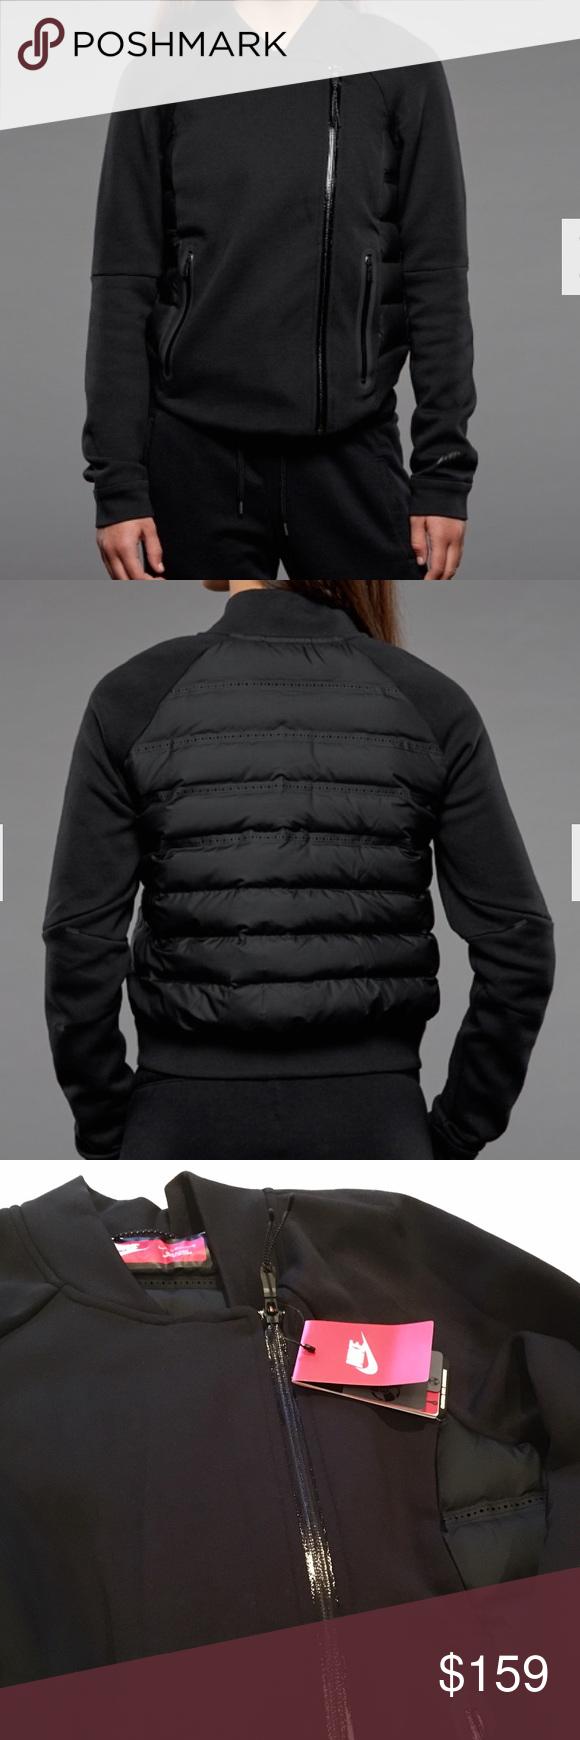 Nwt nike black aeroloft puffer and fleece jacket super cool nike